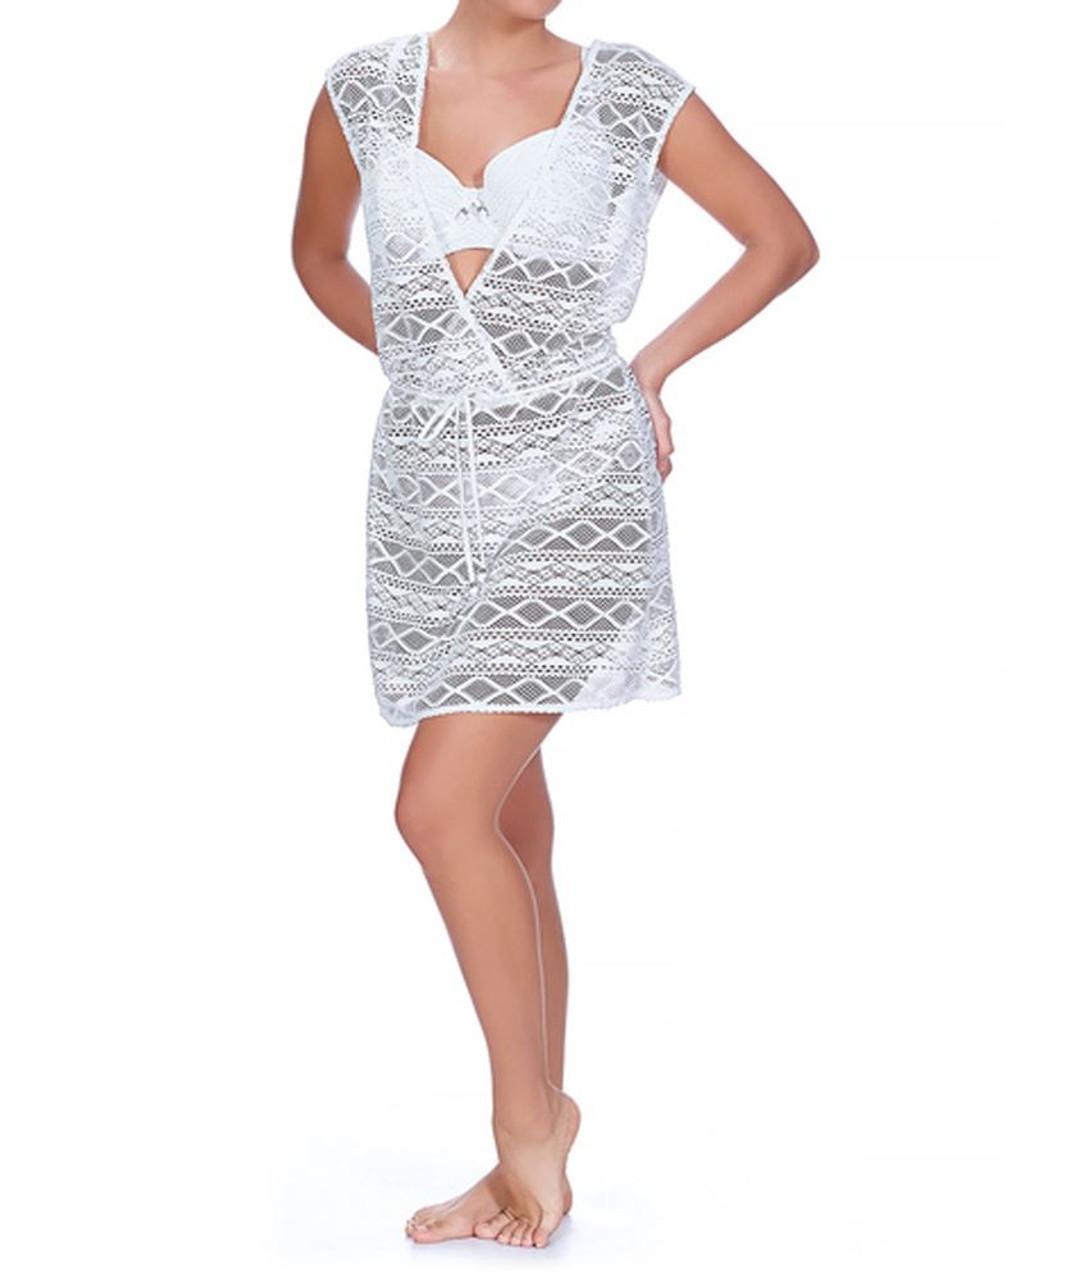 2 ou 4 pièces Femmes Leggings Capri Legging leggins 150den 3//4 Long 1c7 1